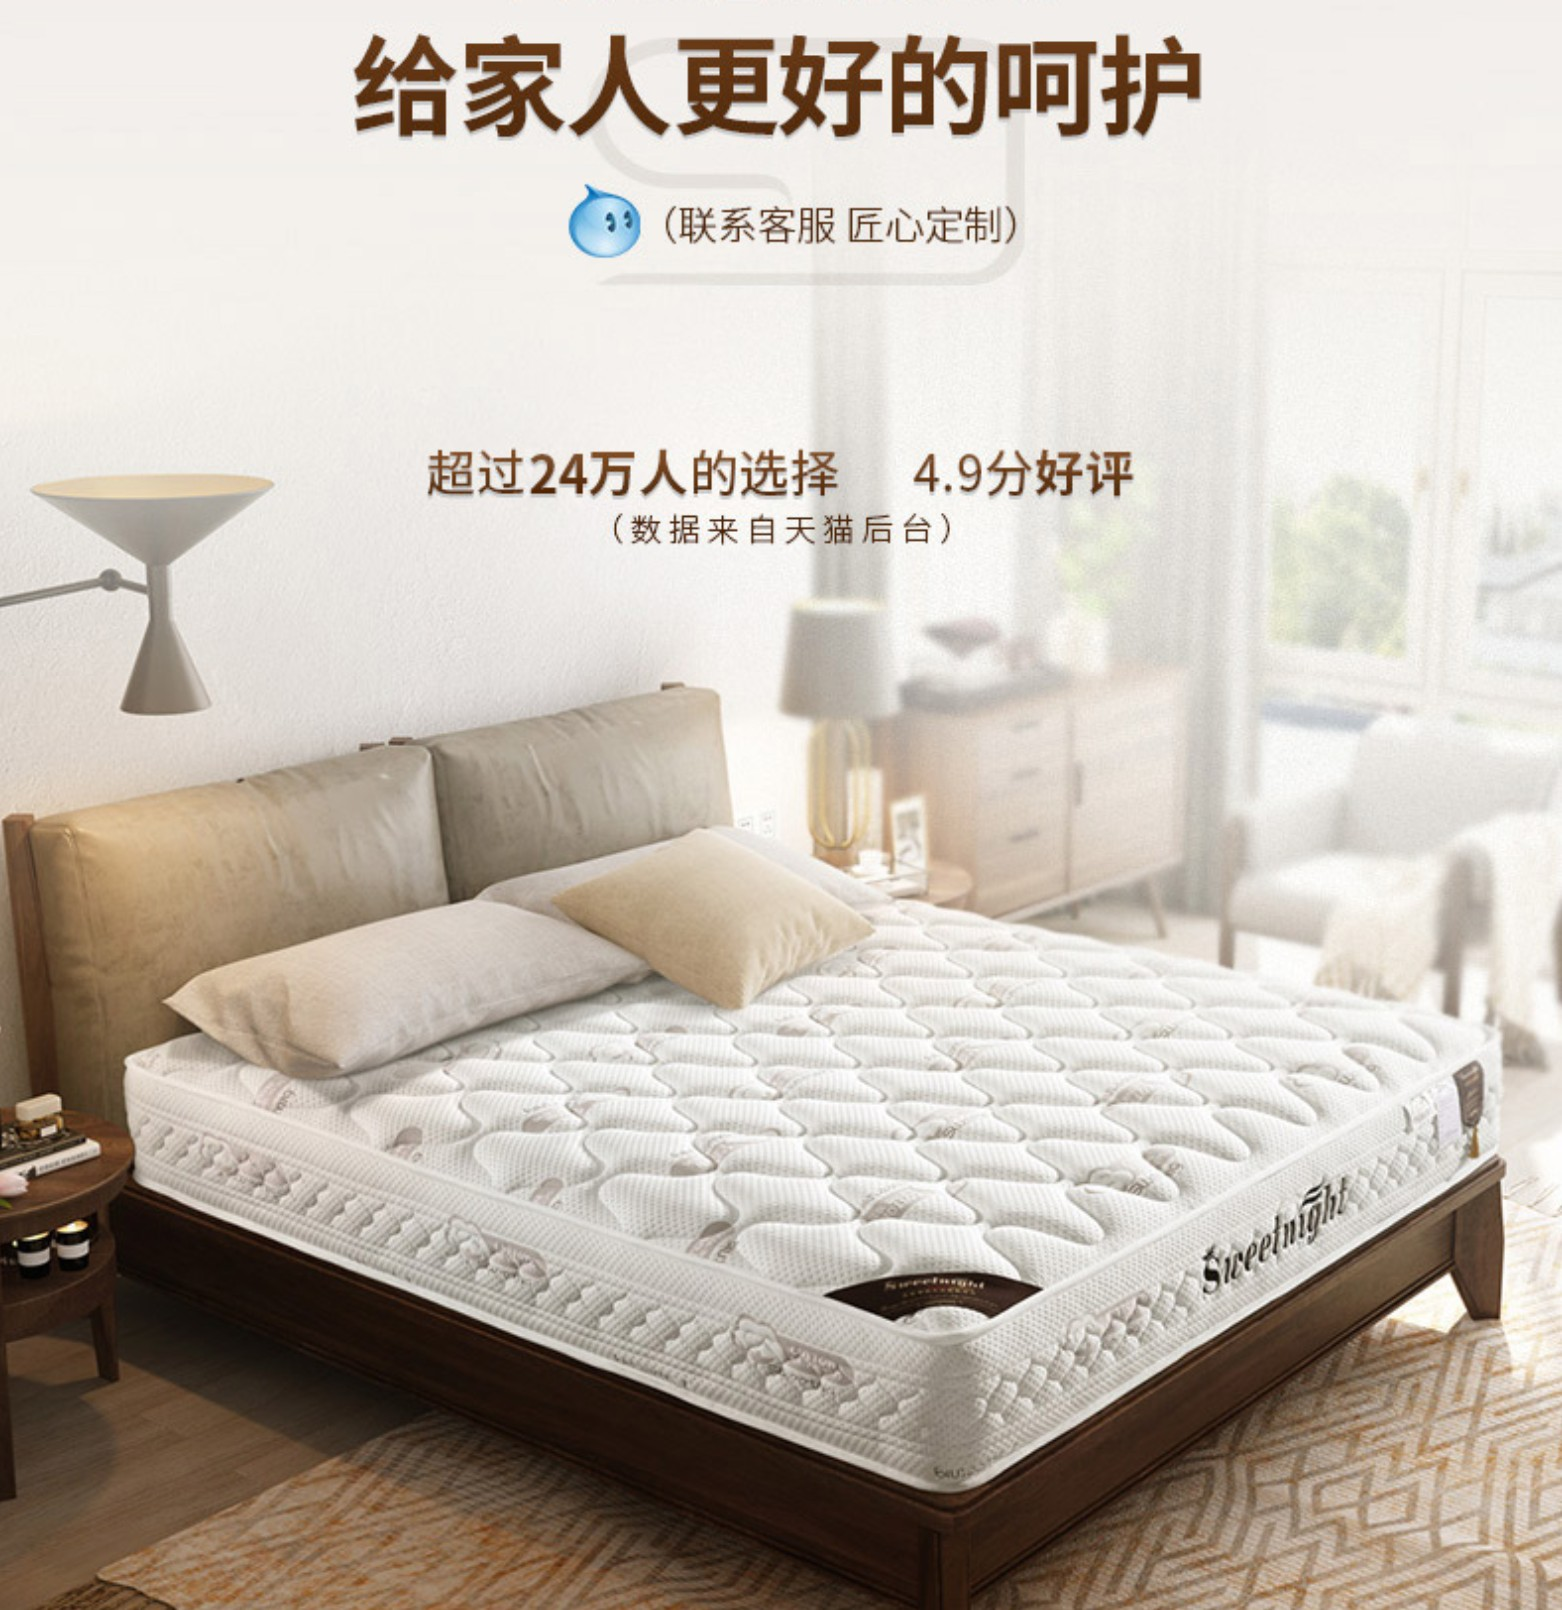 SW天然乳胶床垫 1.5米1.8m独立弹簧椰棕垫软硬两用定制加厚席梦思